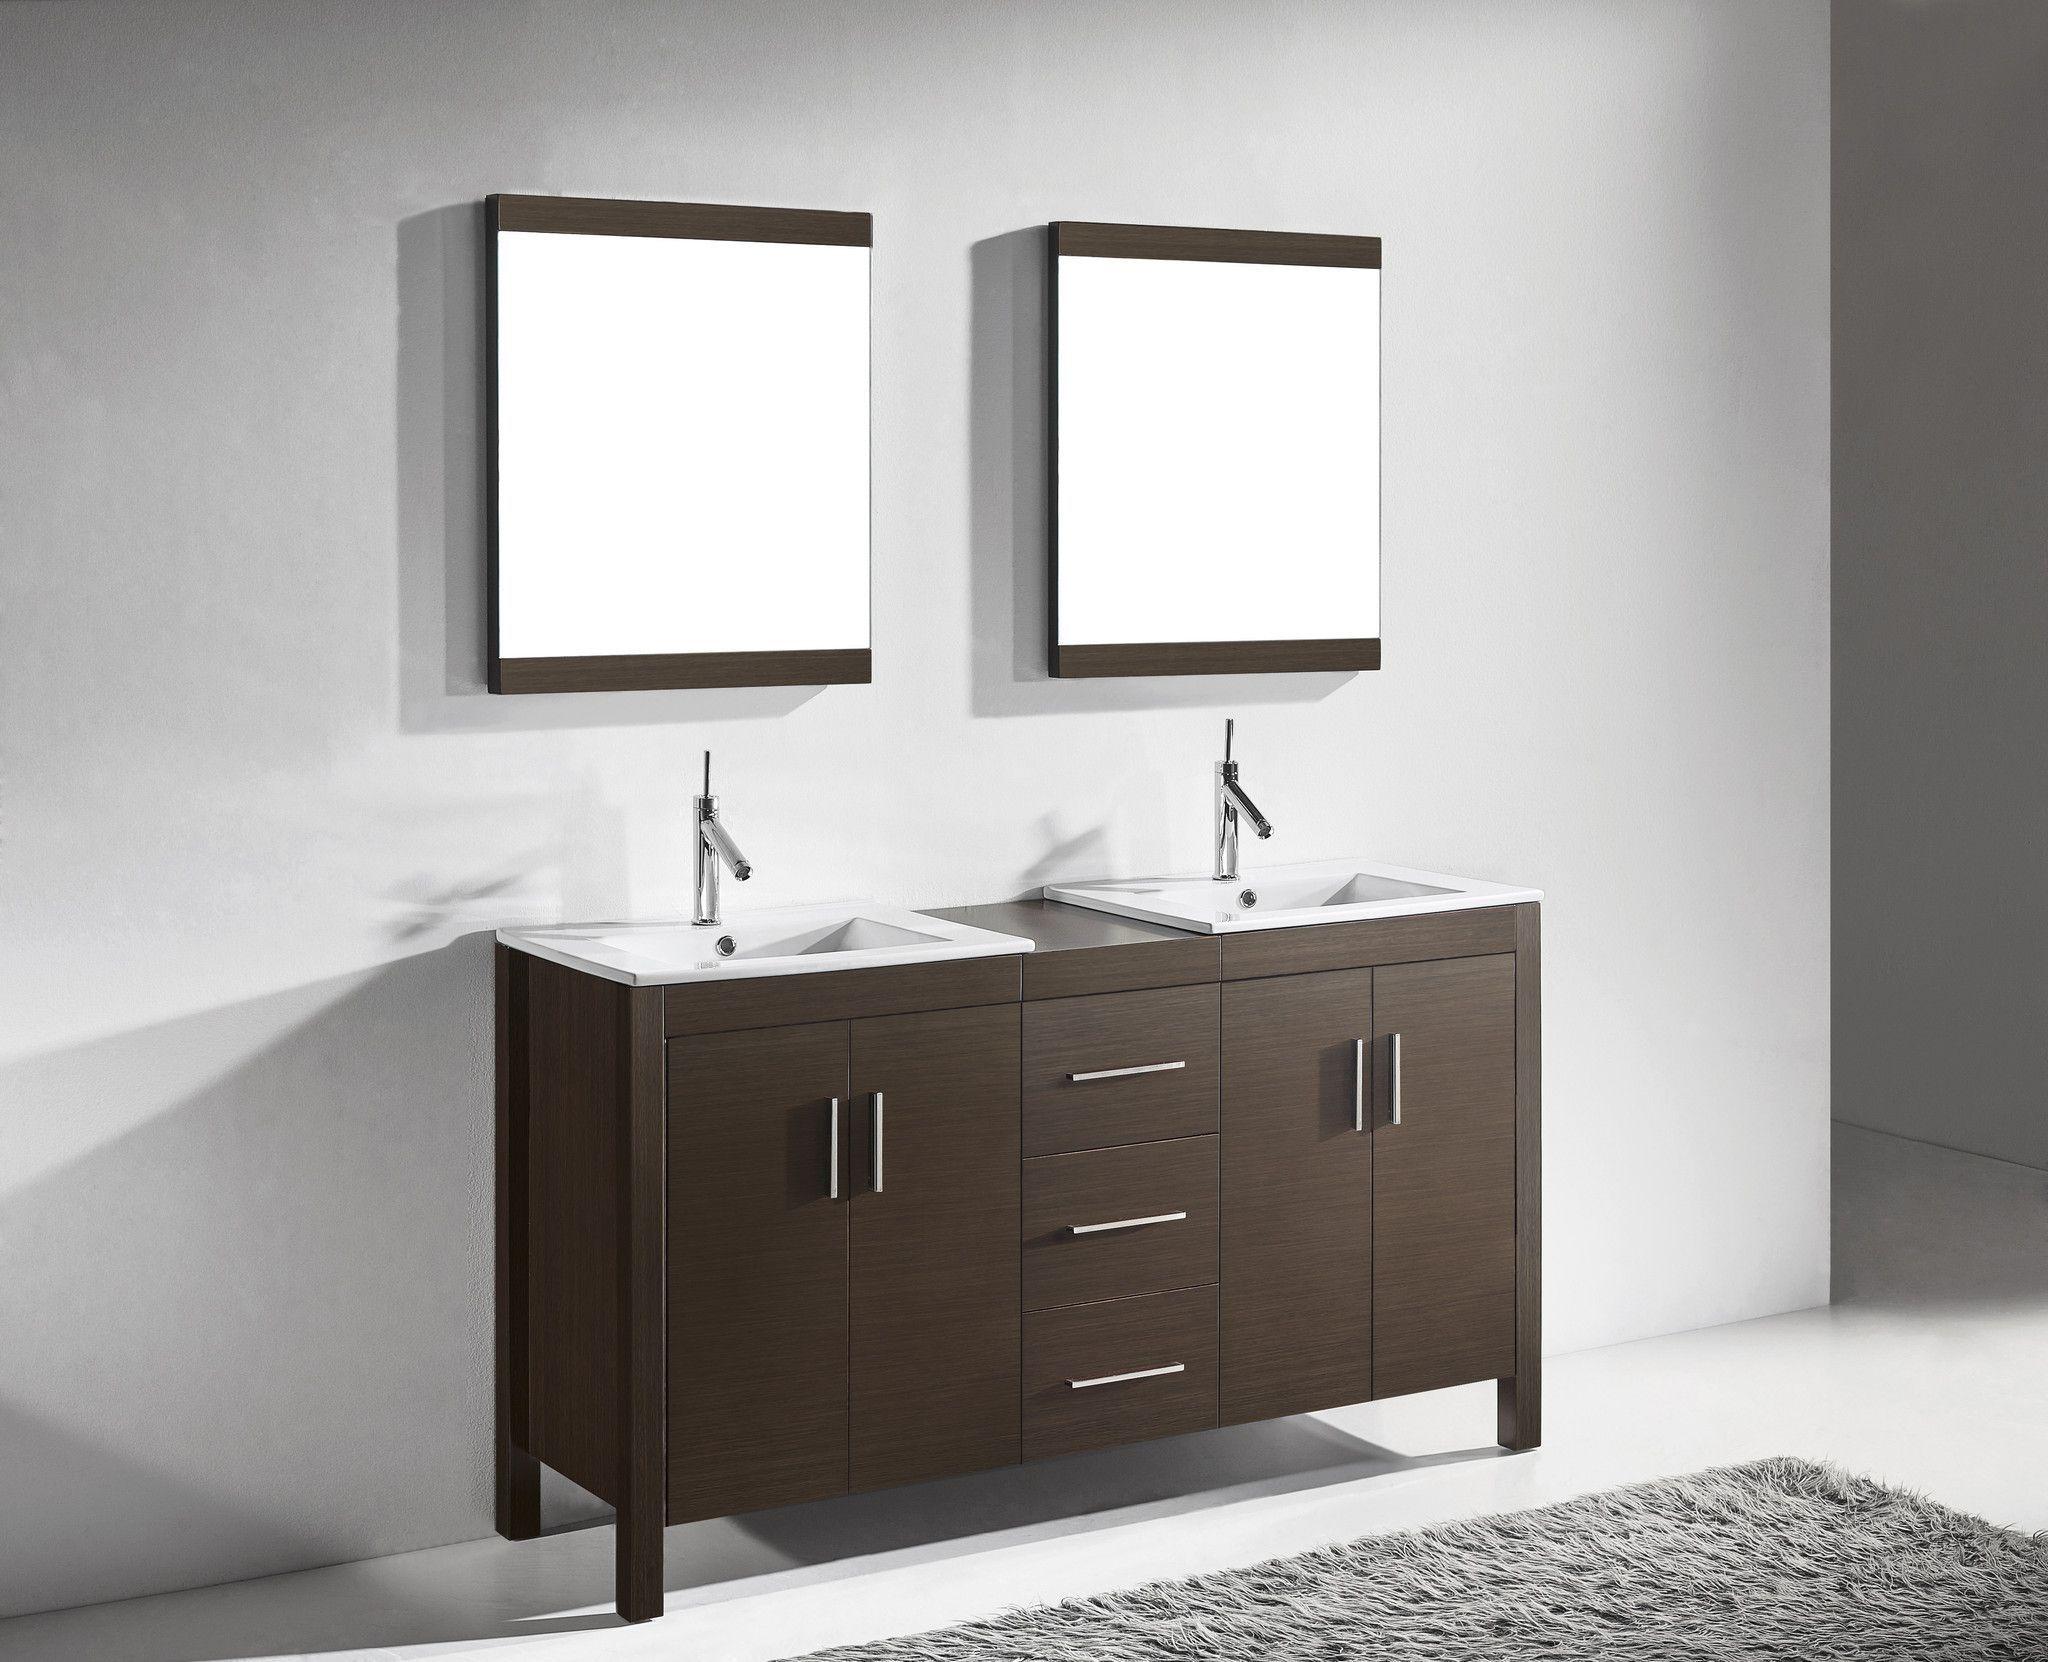 Adornus TRENTO-60-WAL-C Walnut Vanity | Products | Pinterest | Products